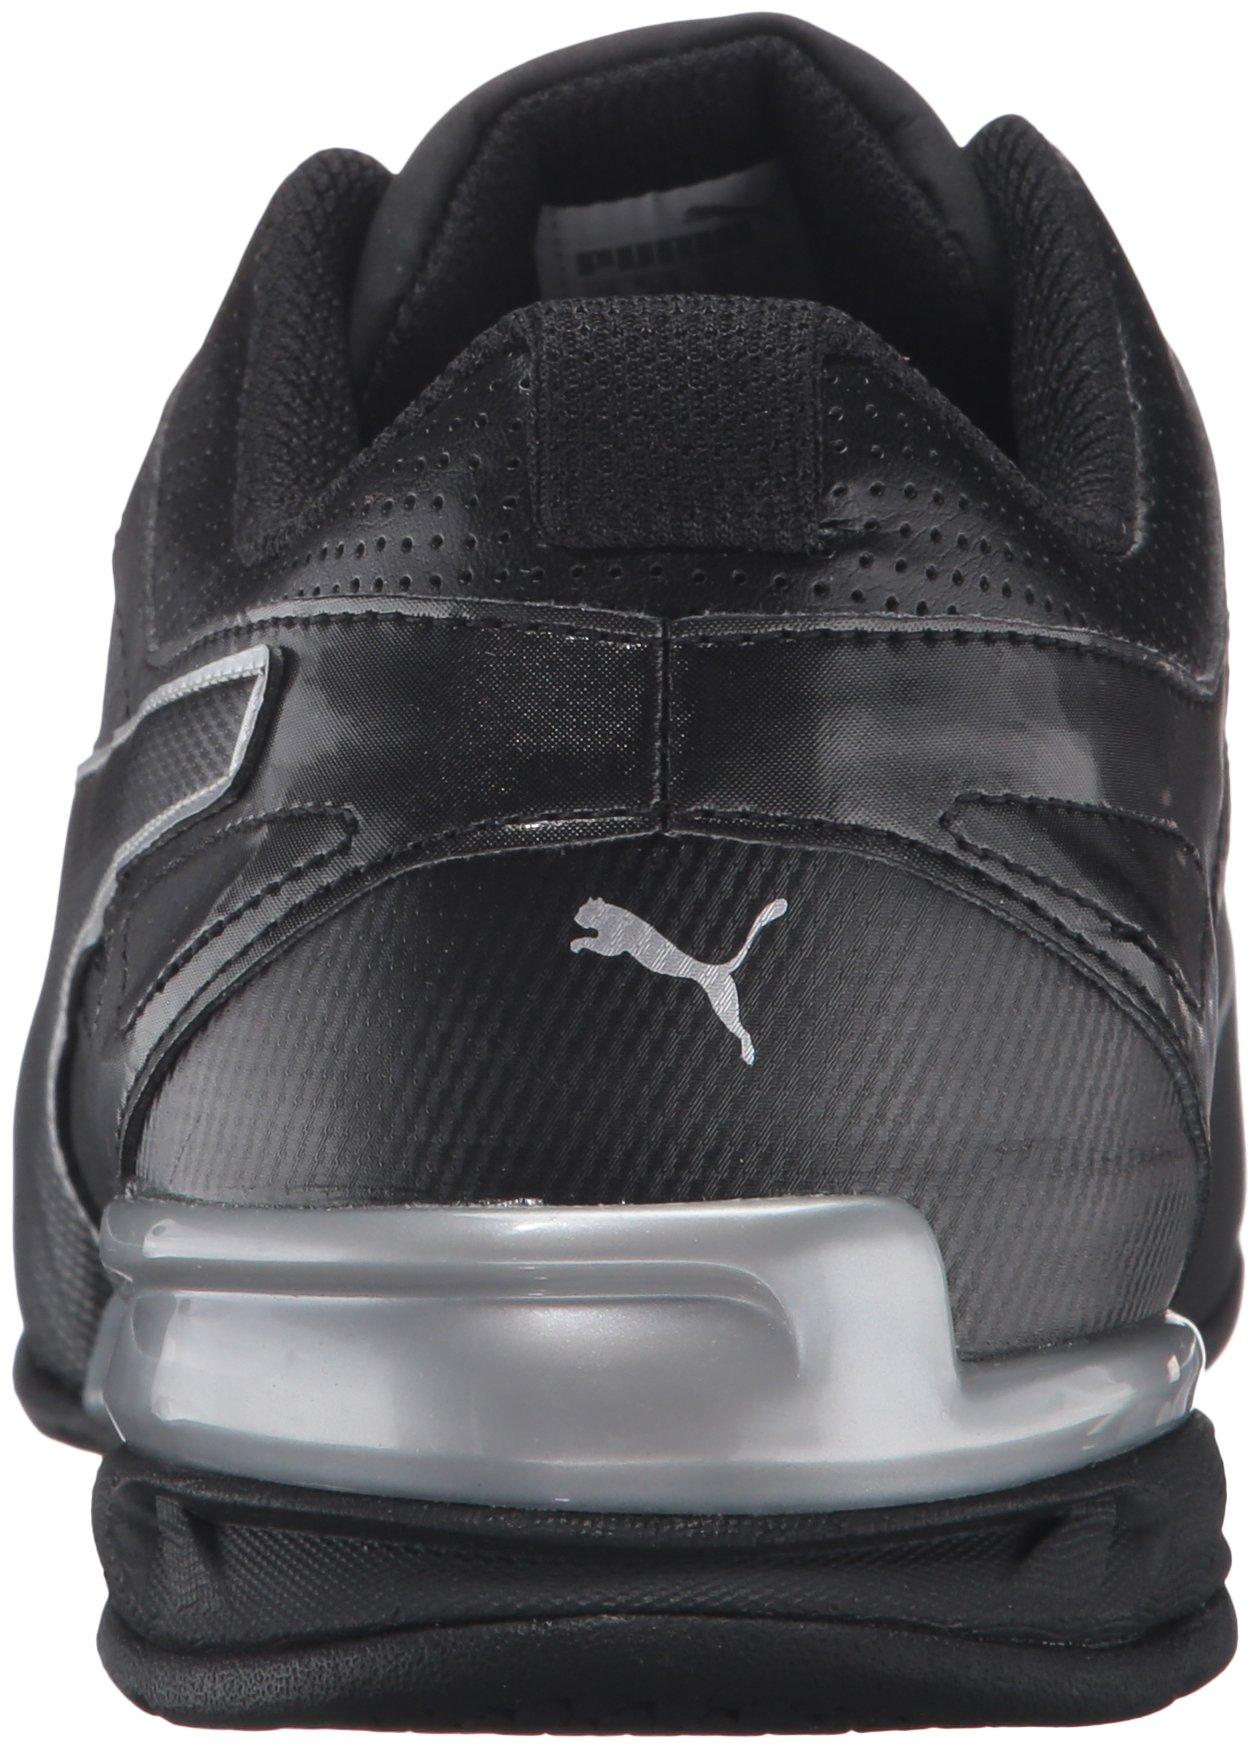 PUMA Men's Tazon 6 FM Puma Black/ Puma Silver Running Shoe - 8 D(M) US by PUMA (Image #2)